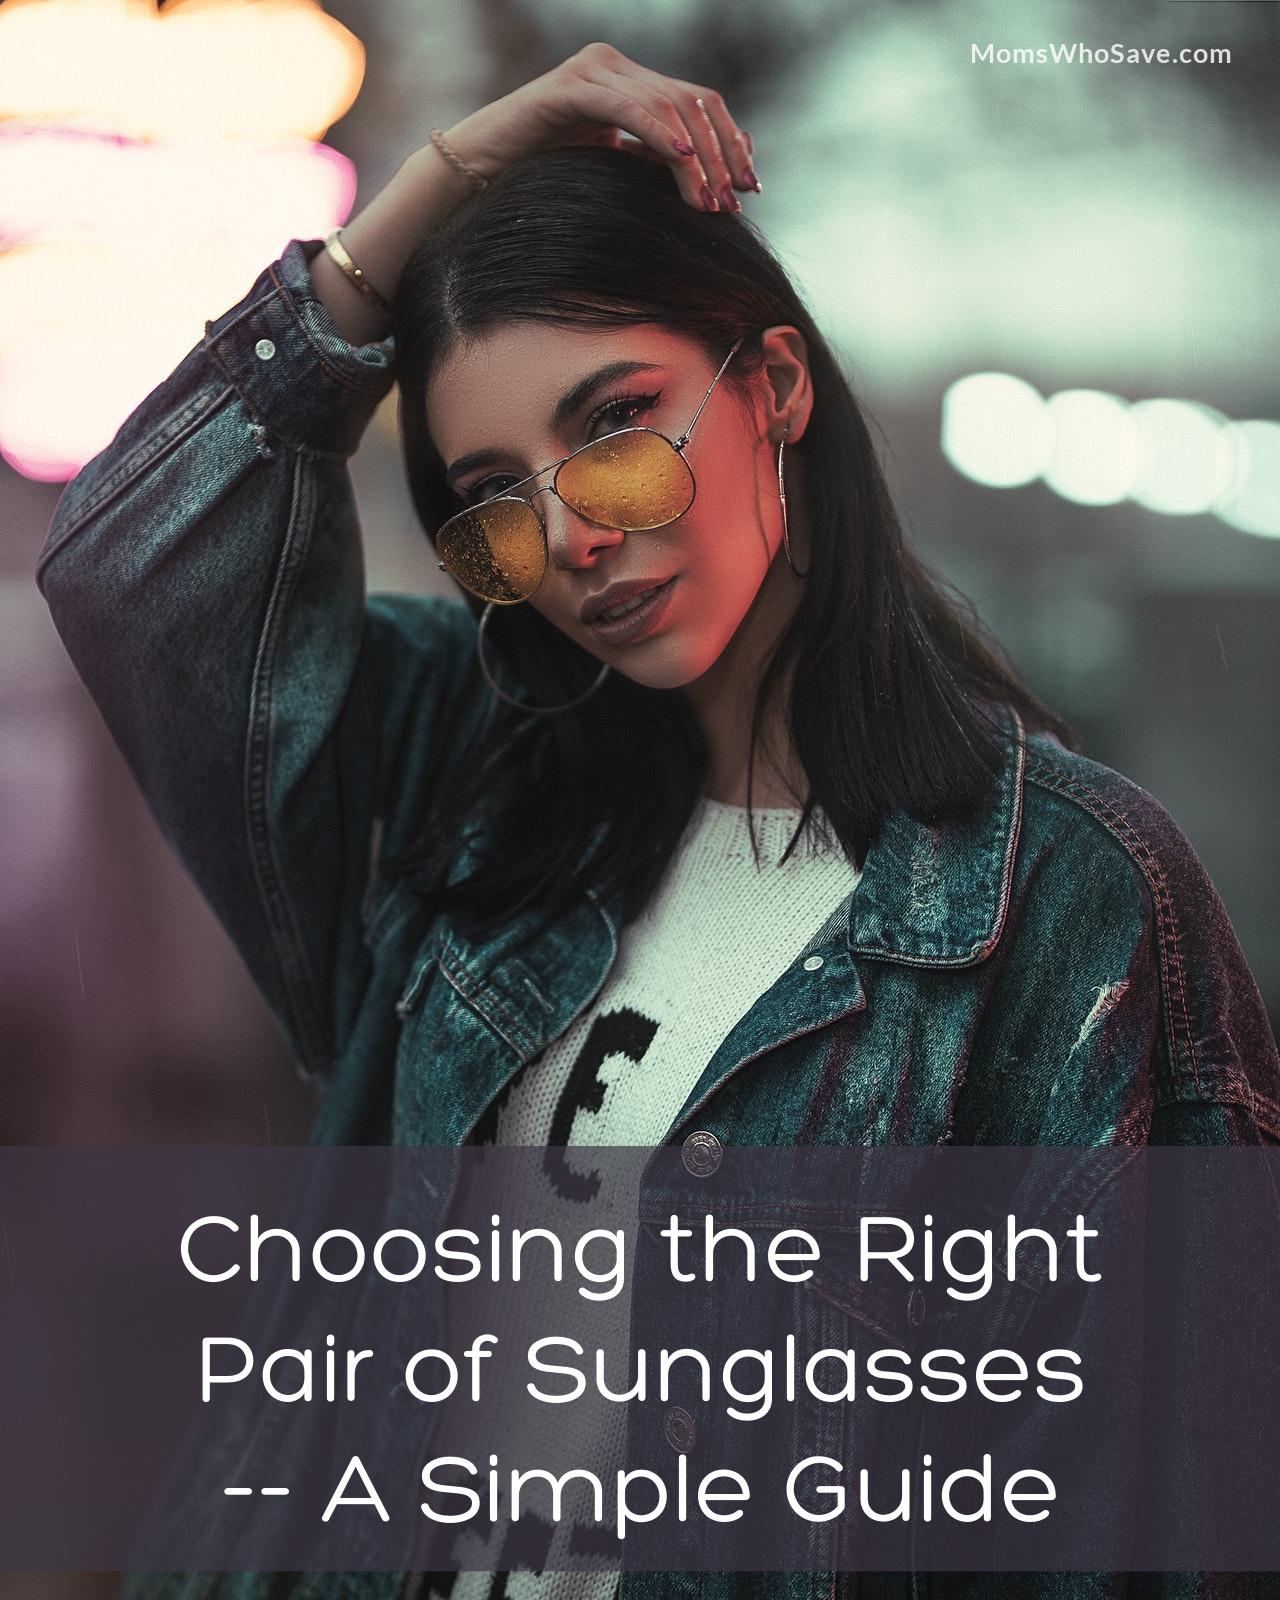 Choosing the Right Pair of Sunglasses